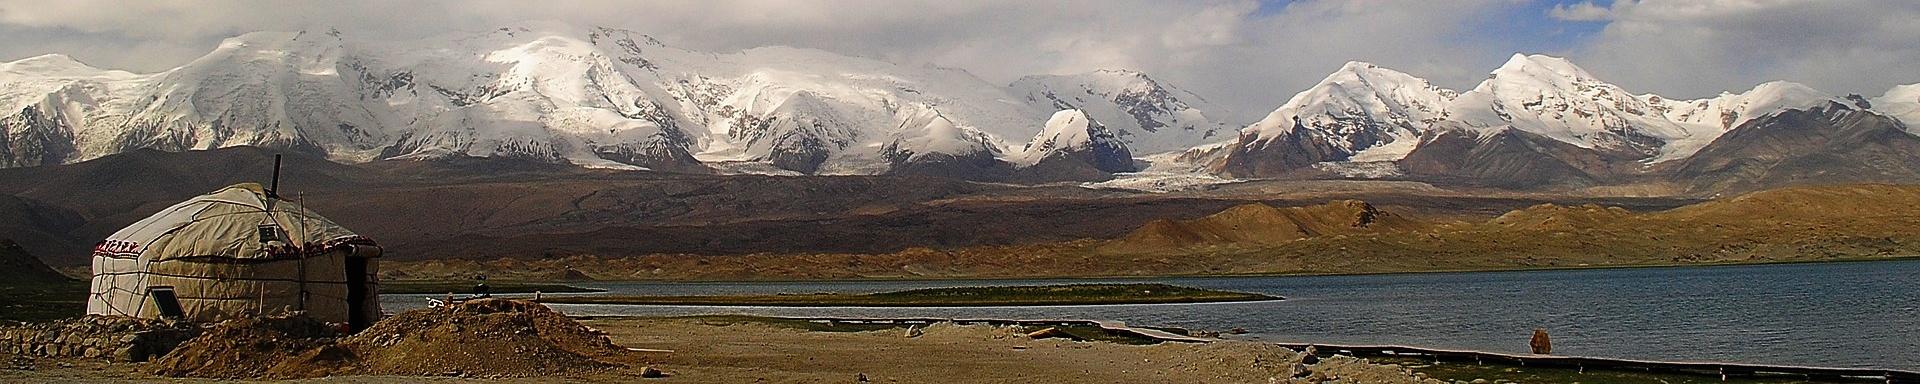 Kirgizie Kirgistan yurt